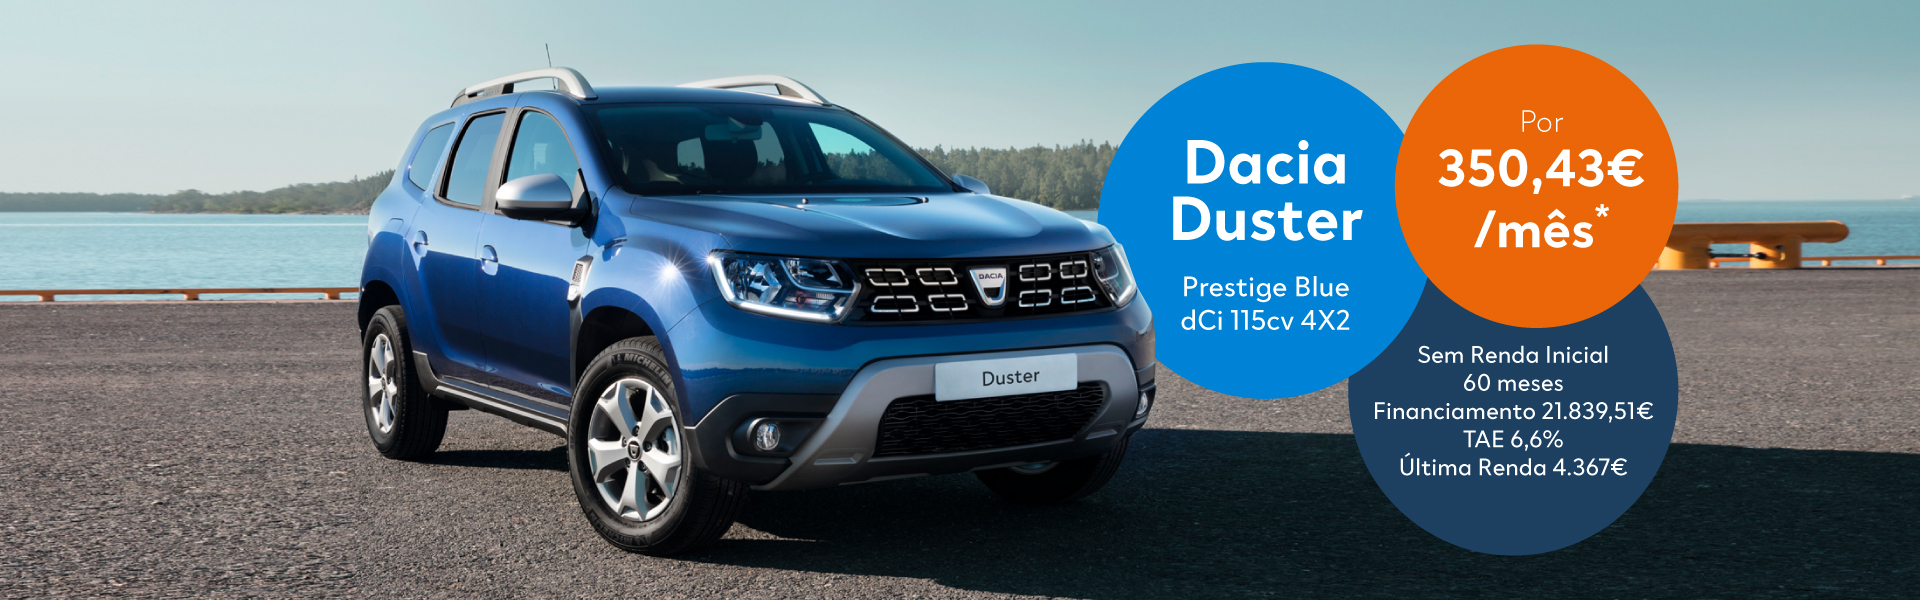 Campanha Dacia Duster